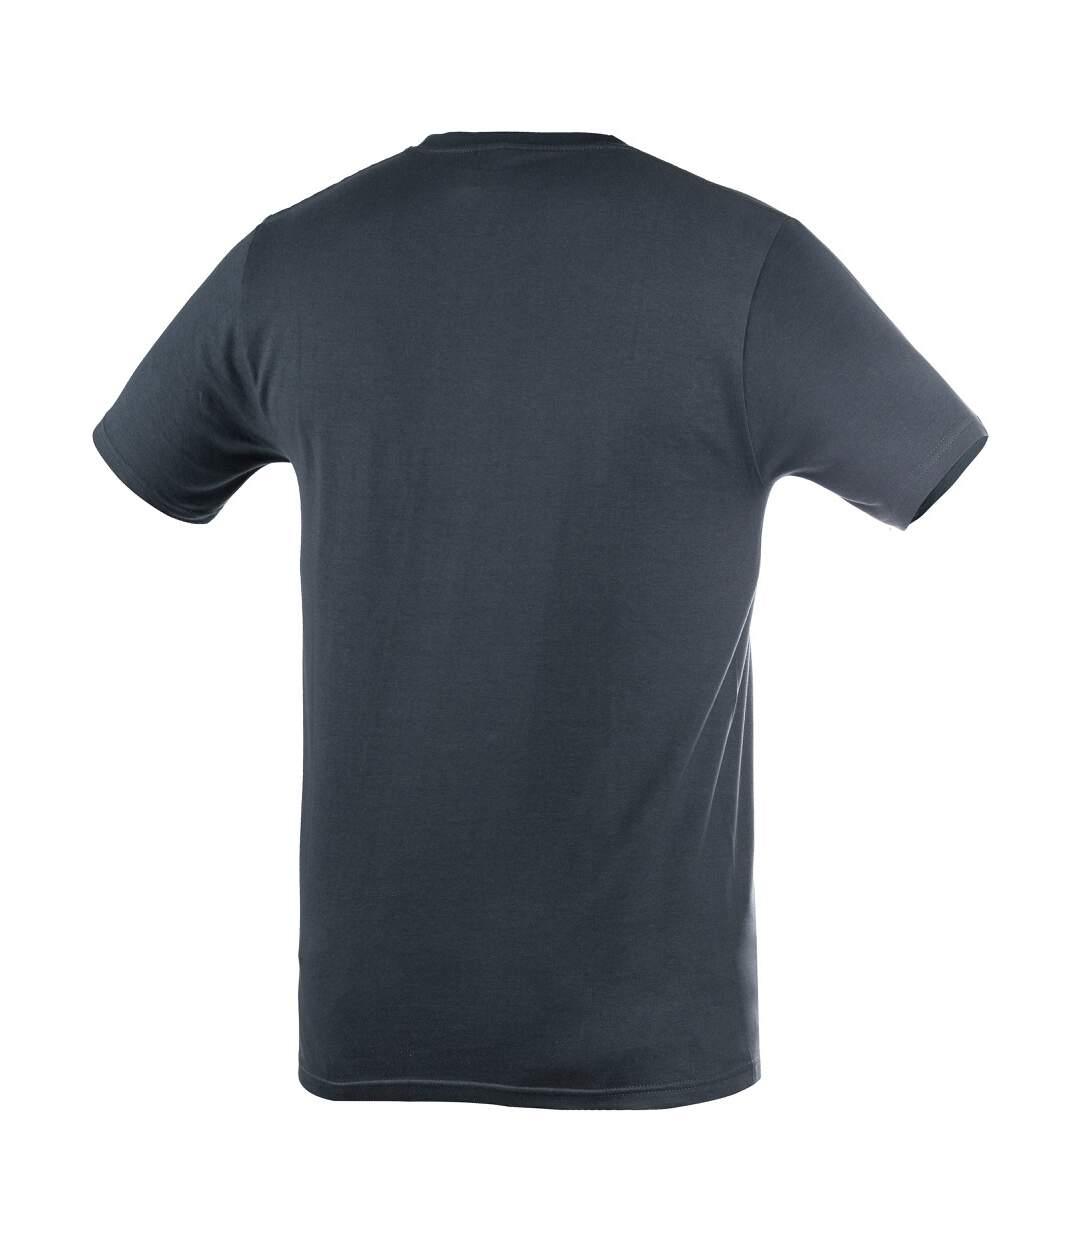 Tee-shirt de travail Job+ Würth MODYF anthracite